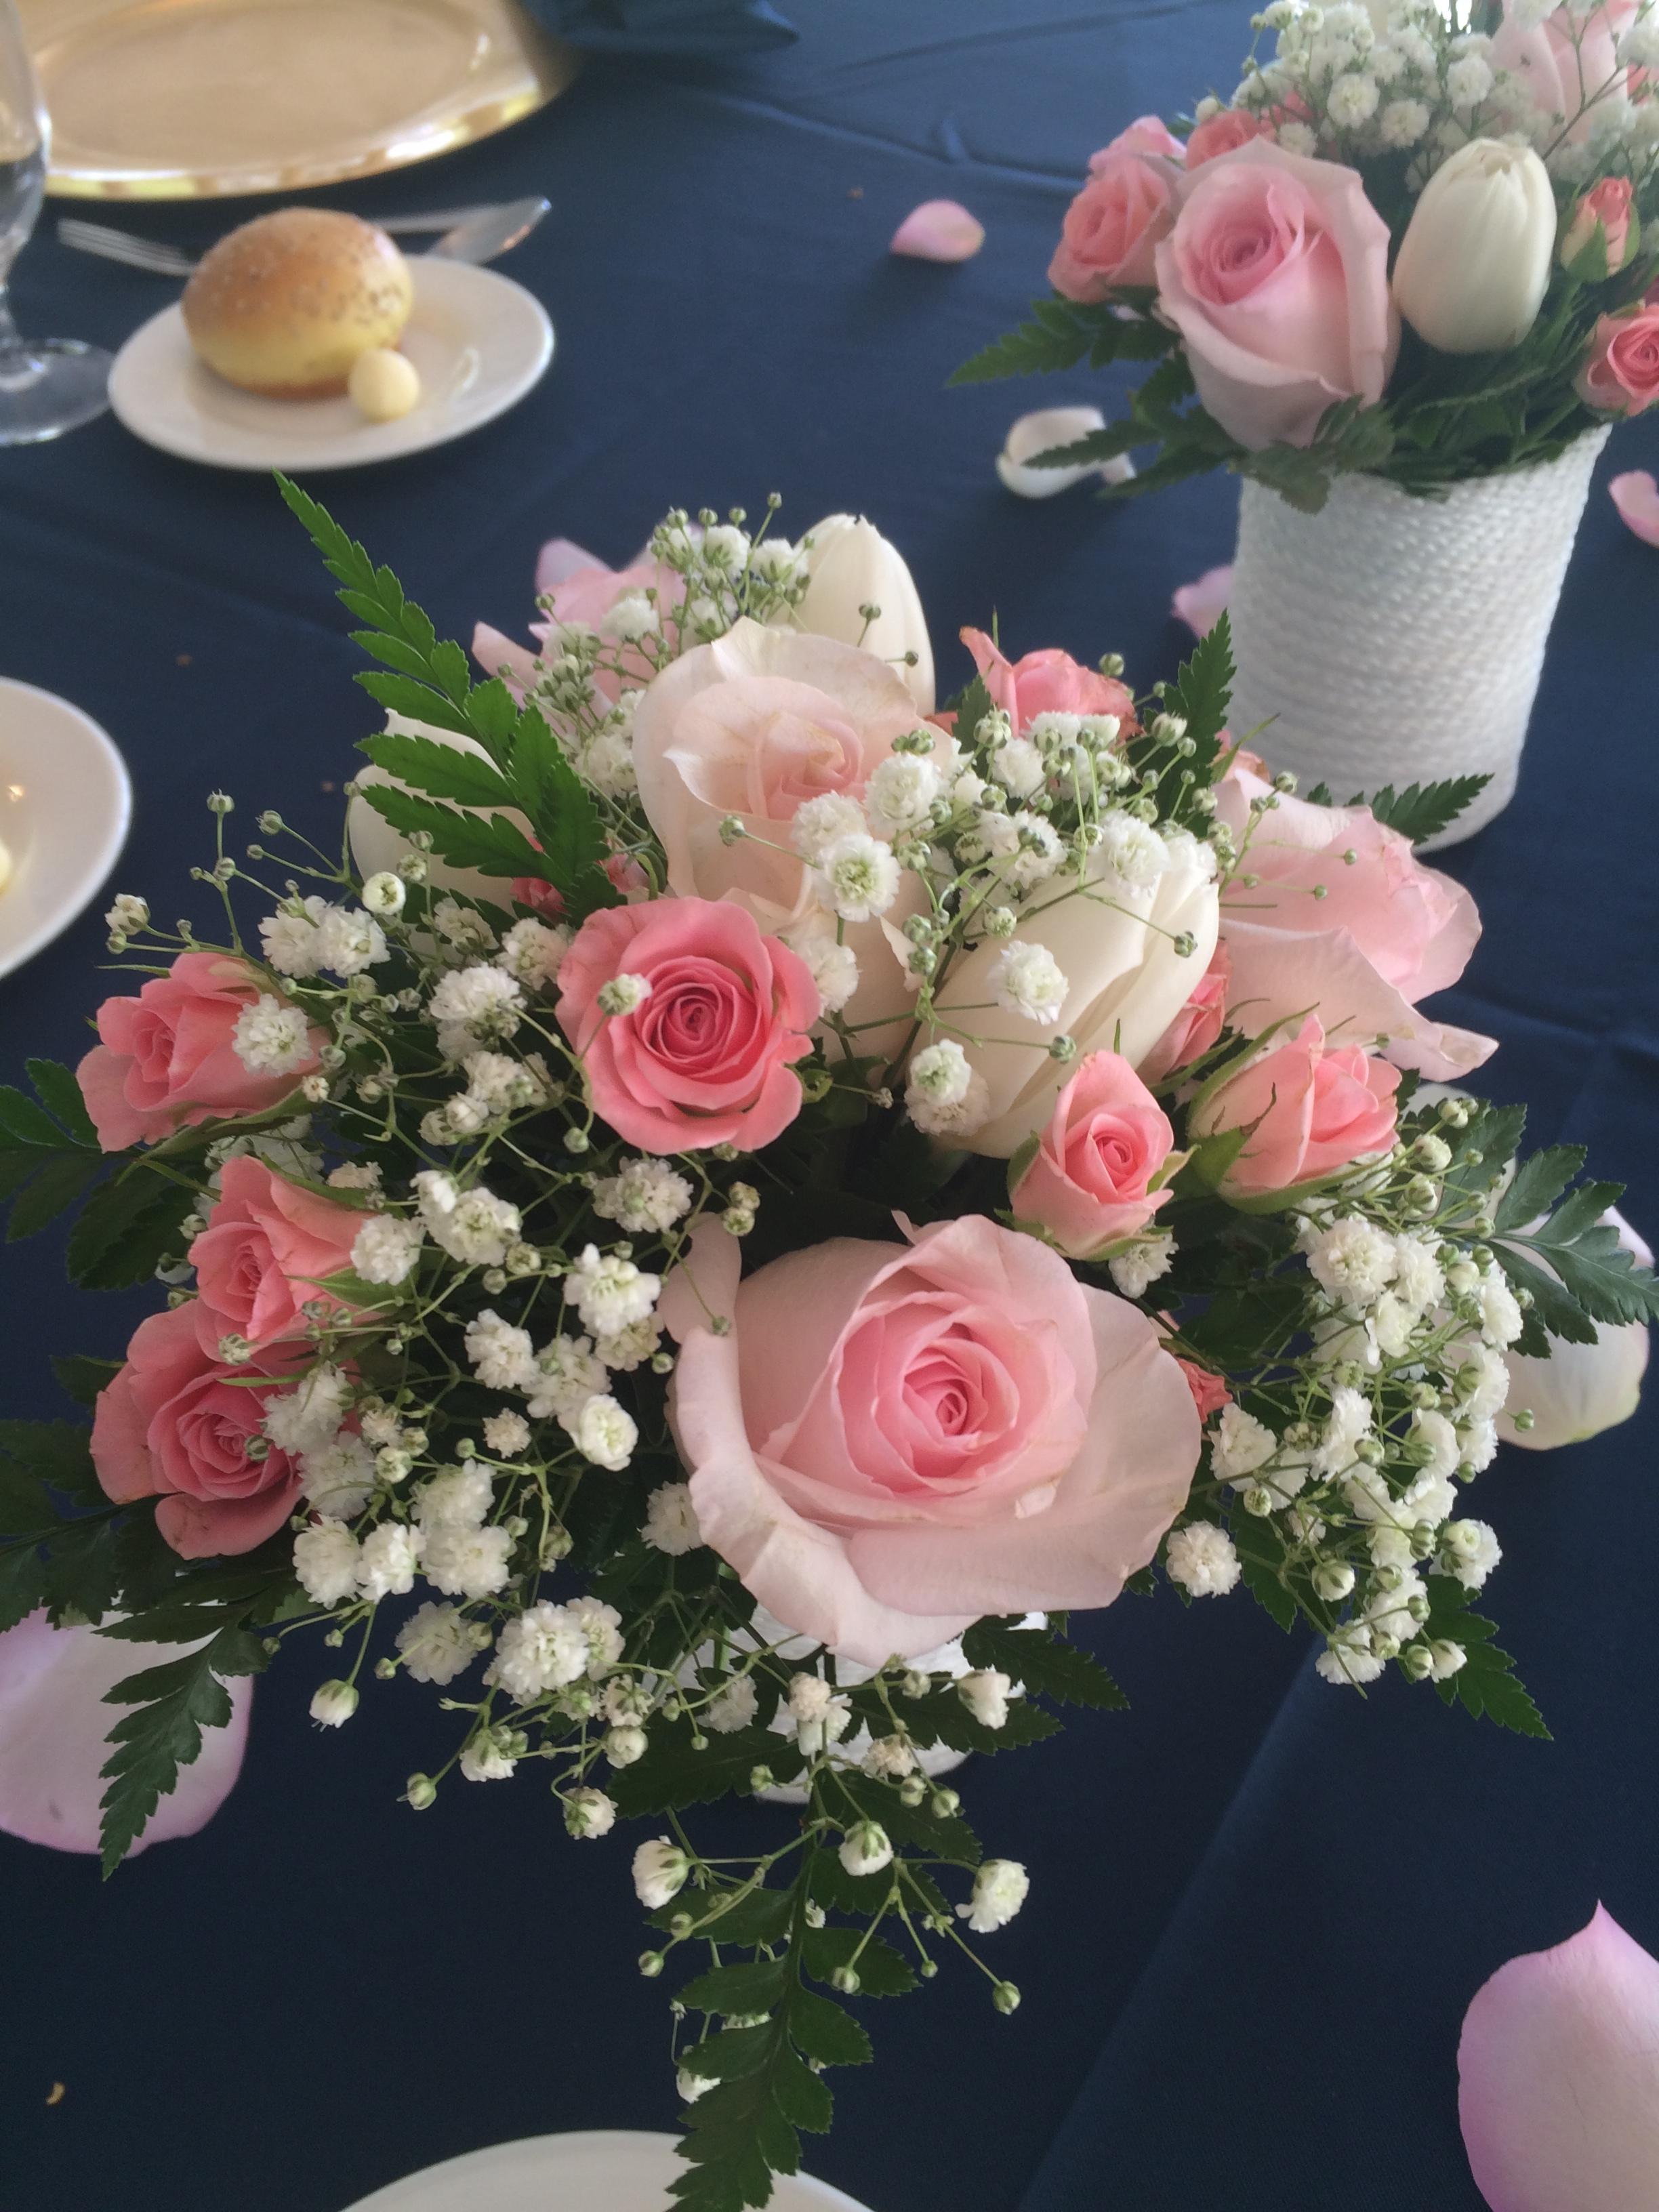 Evelisa Floral & Design: Small flower arrangement